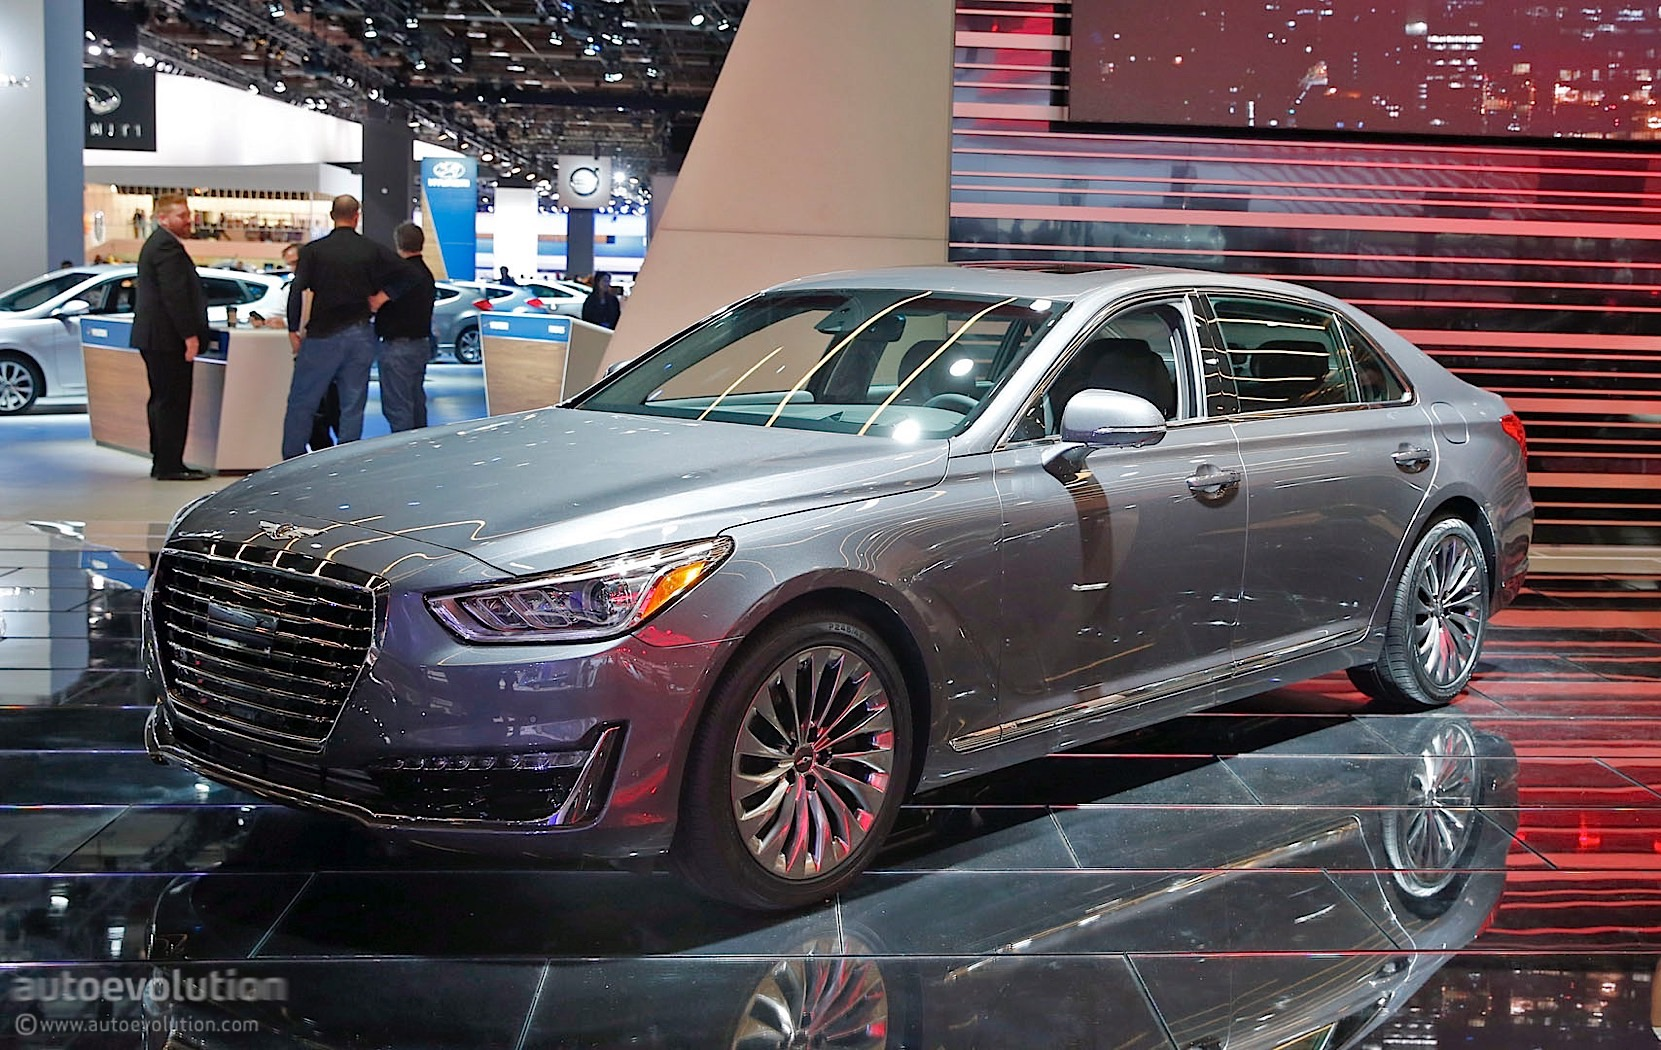 genesis brings g90 luxury sedan at the 2016 detroit auto show autoevolution. Black Bedroom Furniture Sets. Home Design Ideas